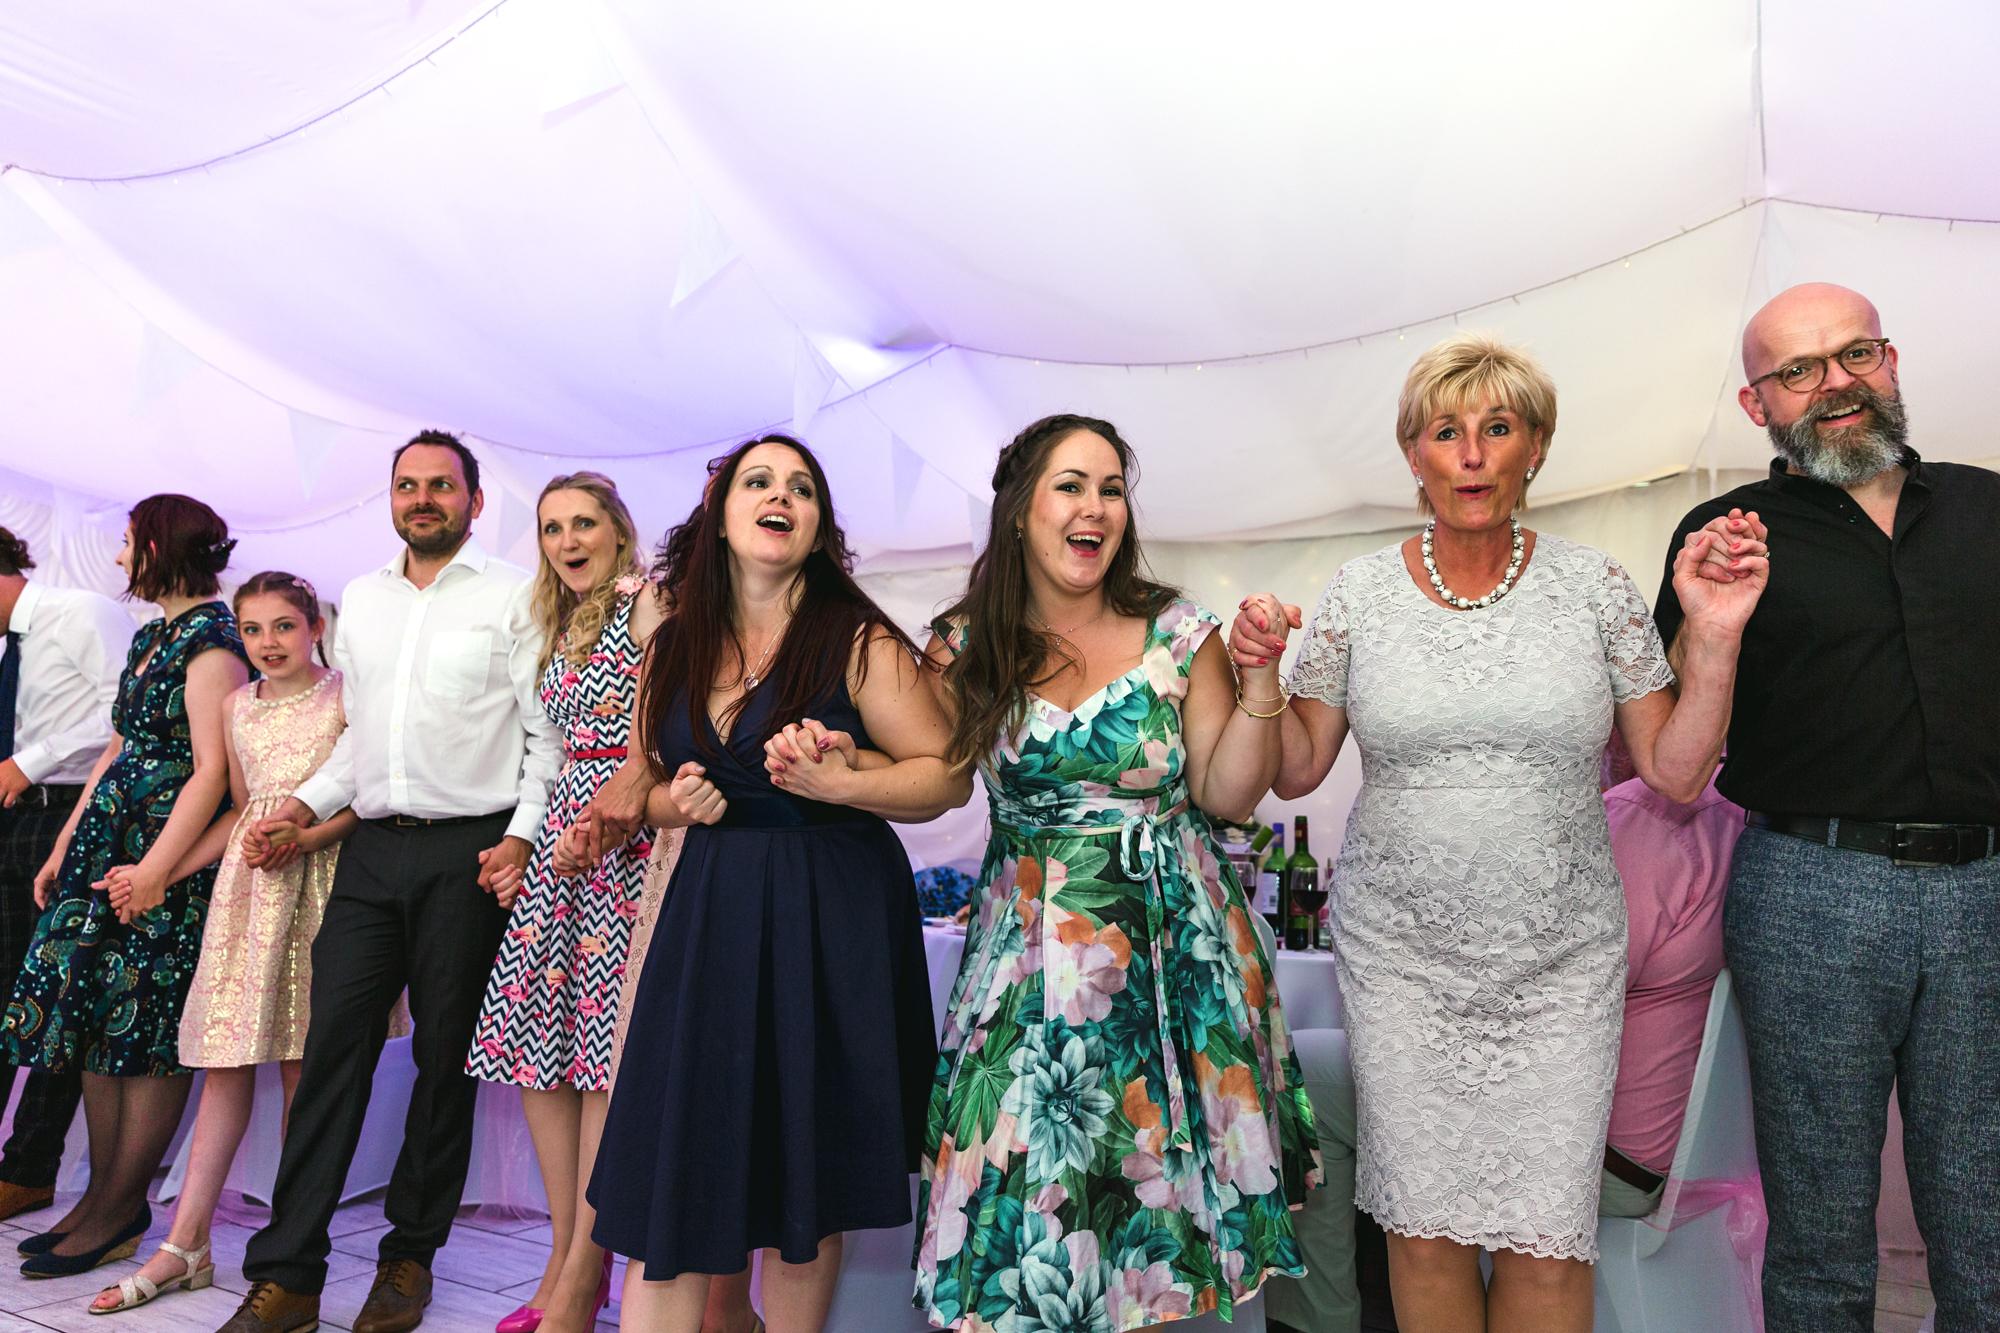 the hoki coki at Ridgeway Golf Course, Thornhill, Caerphilly Mountain. Wedding first dance